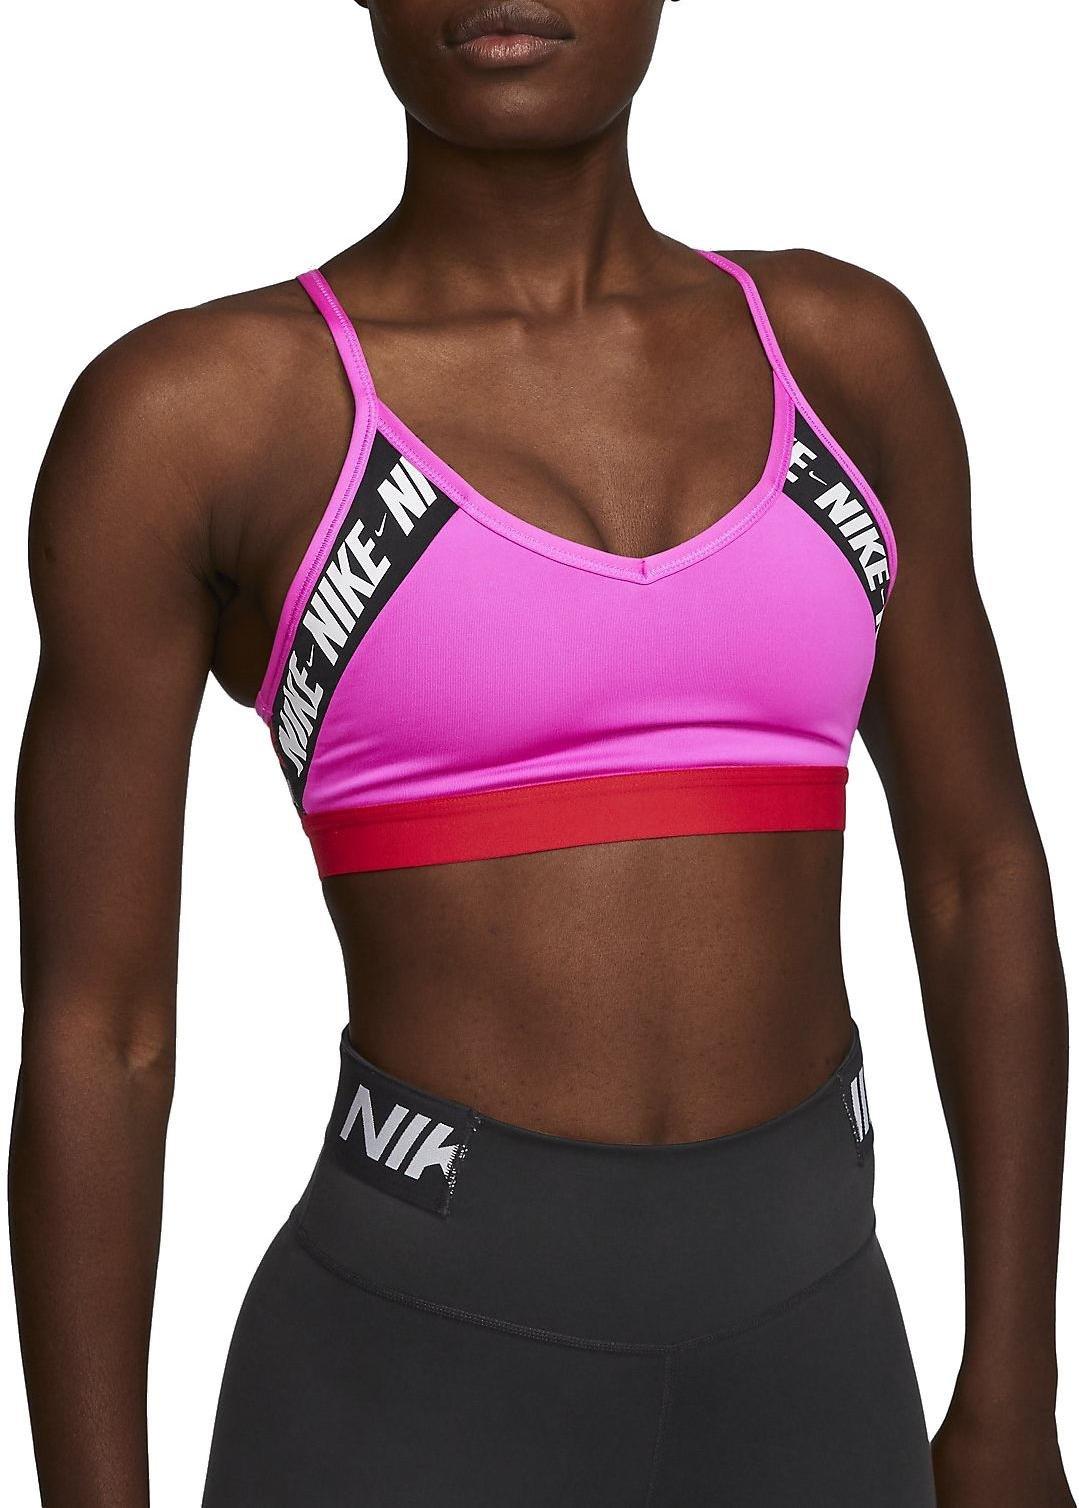 Bra Nike Indy Logo Bra Top4fitness Com